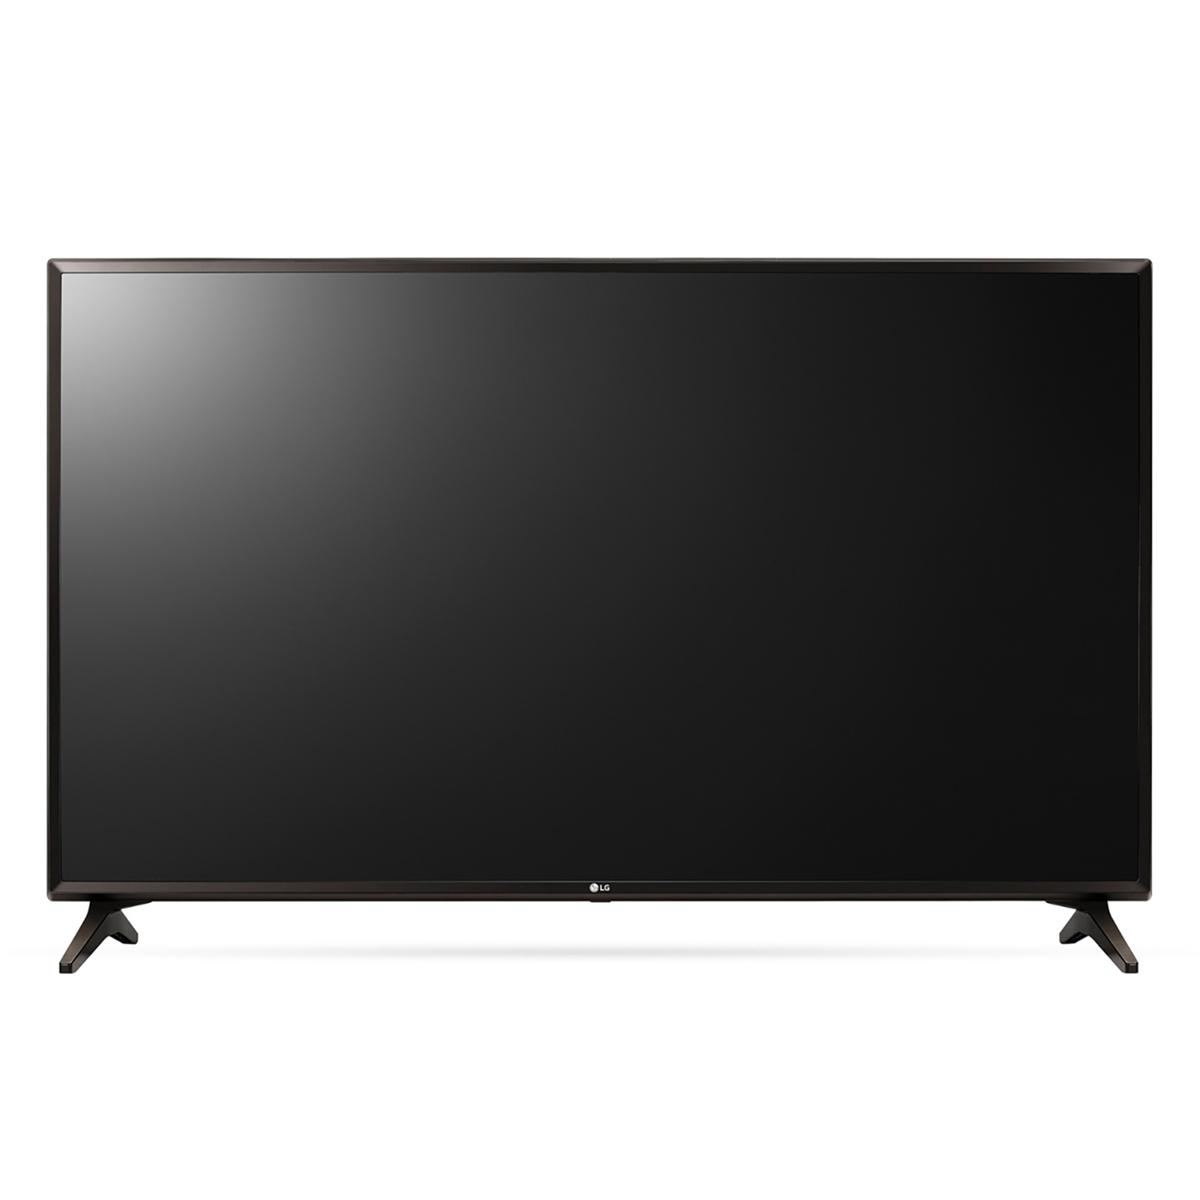 Smart TV Led 43 LG Pro Thinq AI Full HD 2 HDMI Bluetooth Wi-Fi